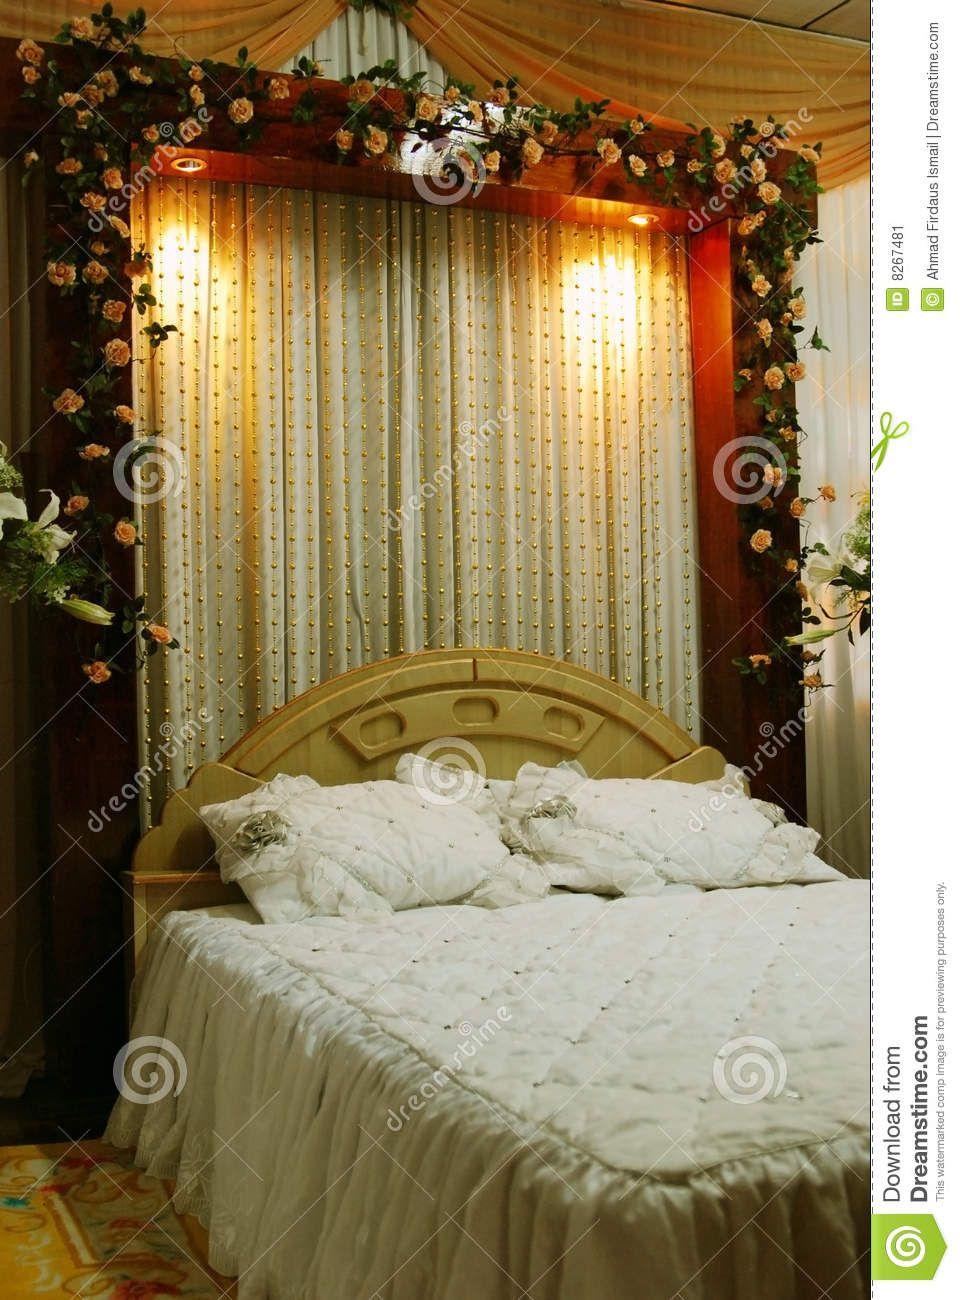 Wedding room decoration ideas  Pin by Linda Siddik on Dekorasi rumah  Pinterest  Banquet